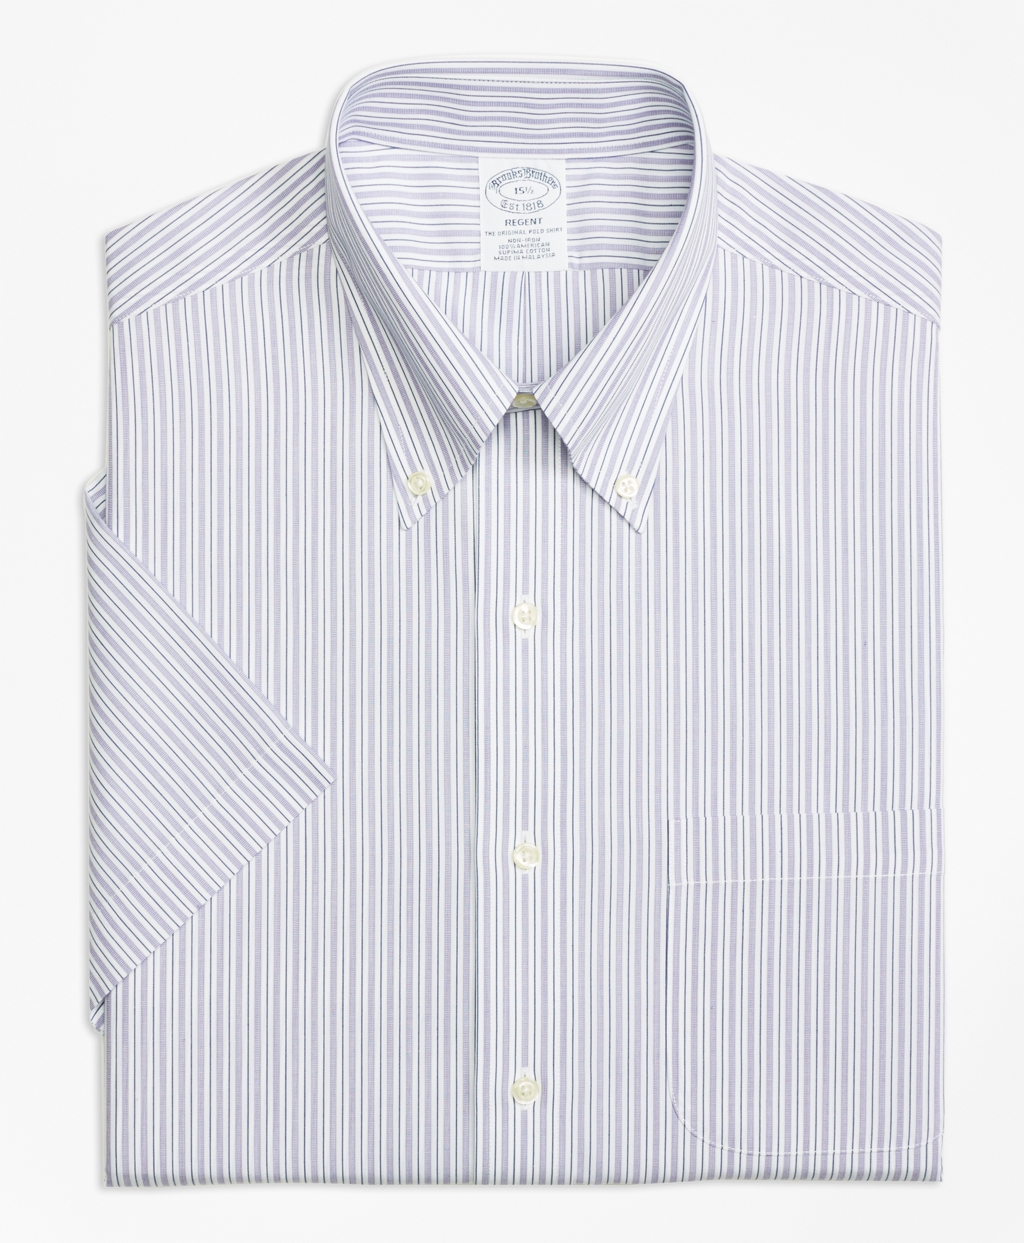 Brooks brothers non iron regent fit split stripe short for Brooks brothers non iron shirts review